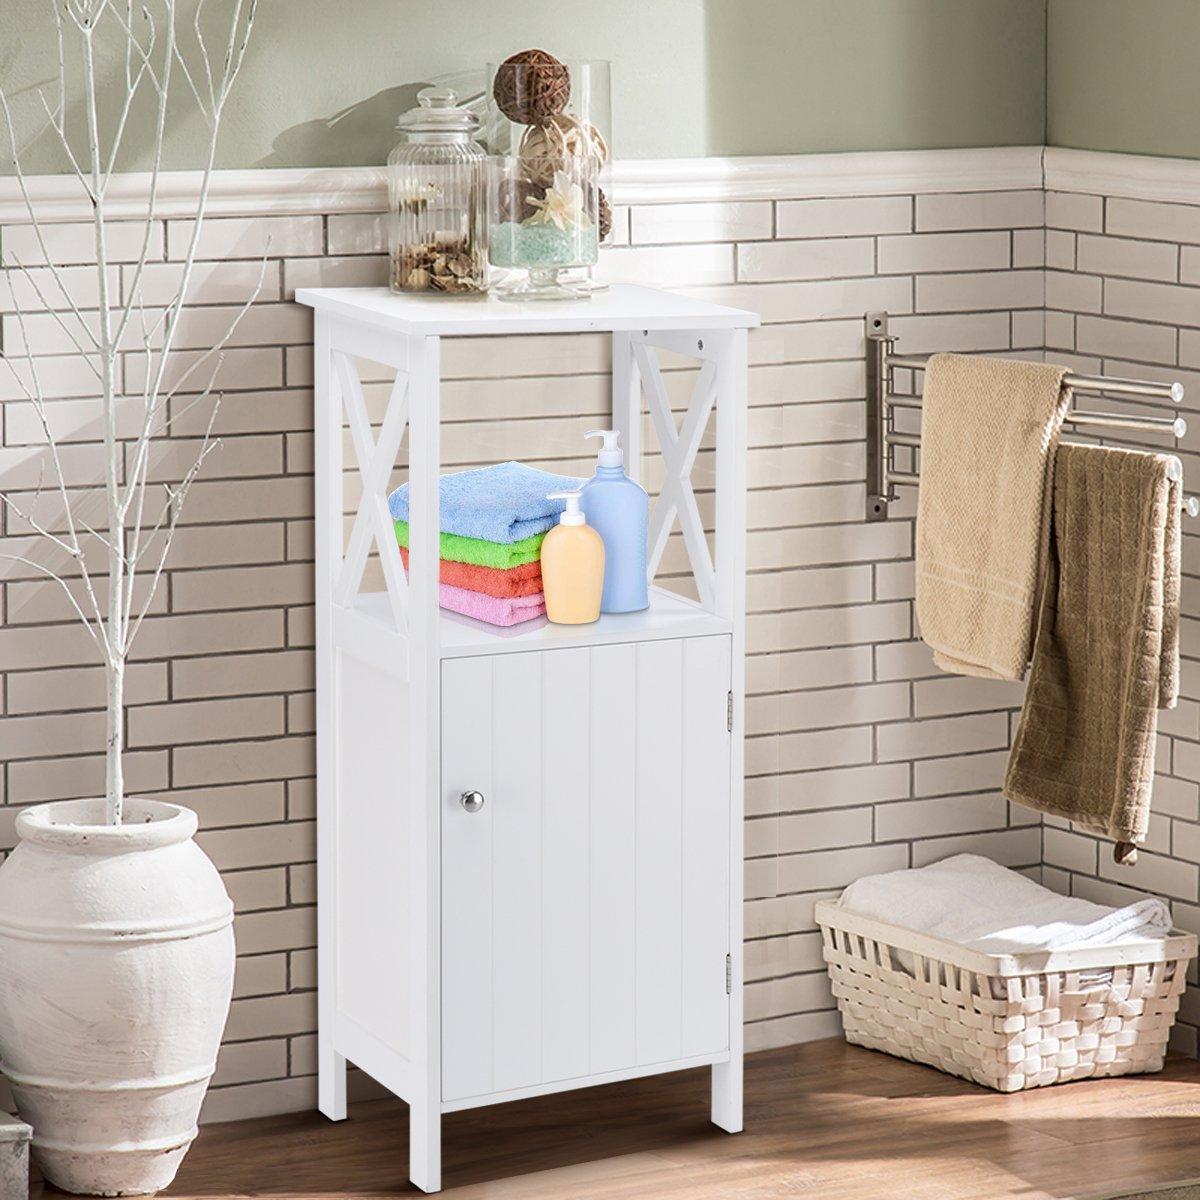 Costway Bathroom Cabinet Freestanding Floor Stand Storage Carved Shelving Cupboard Wood Indoor Home White